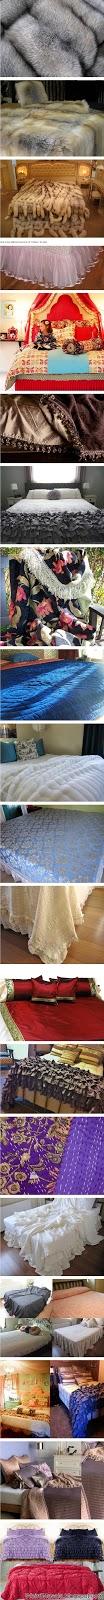 Glamorous sofa cover